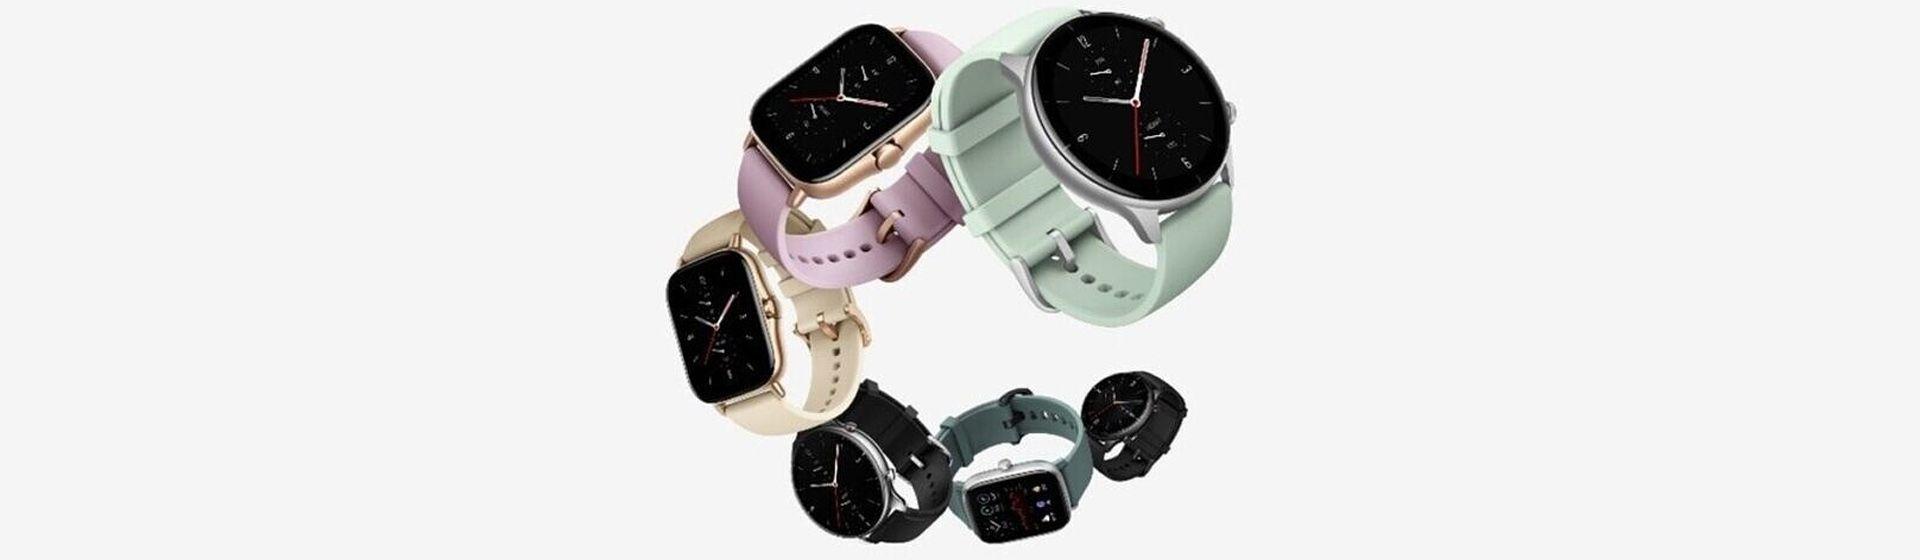 Xiaomi lança smartwatches Amazfit GTS 2, GTS 2e, GTS 2 Mini, GTR 2, GTR 2 LTE e GTR 2e